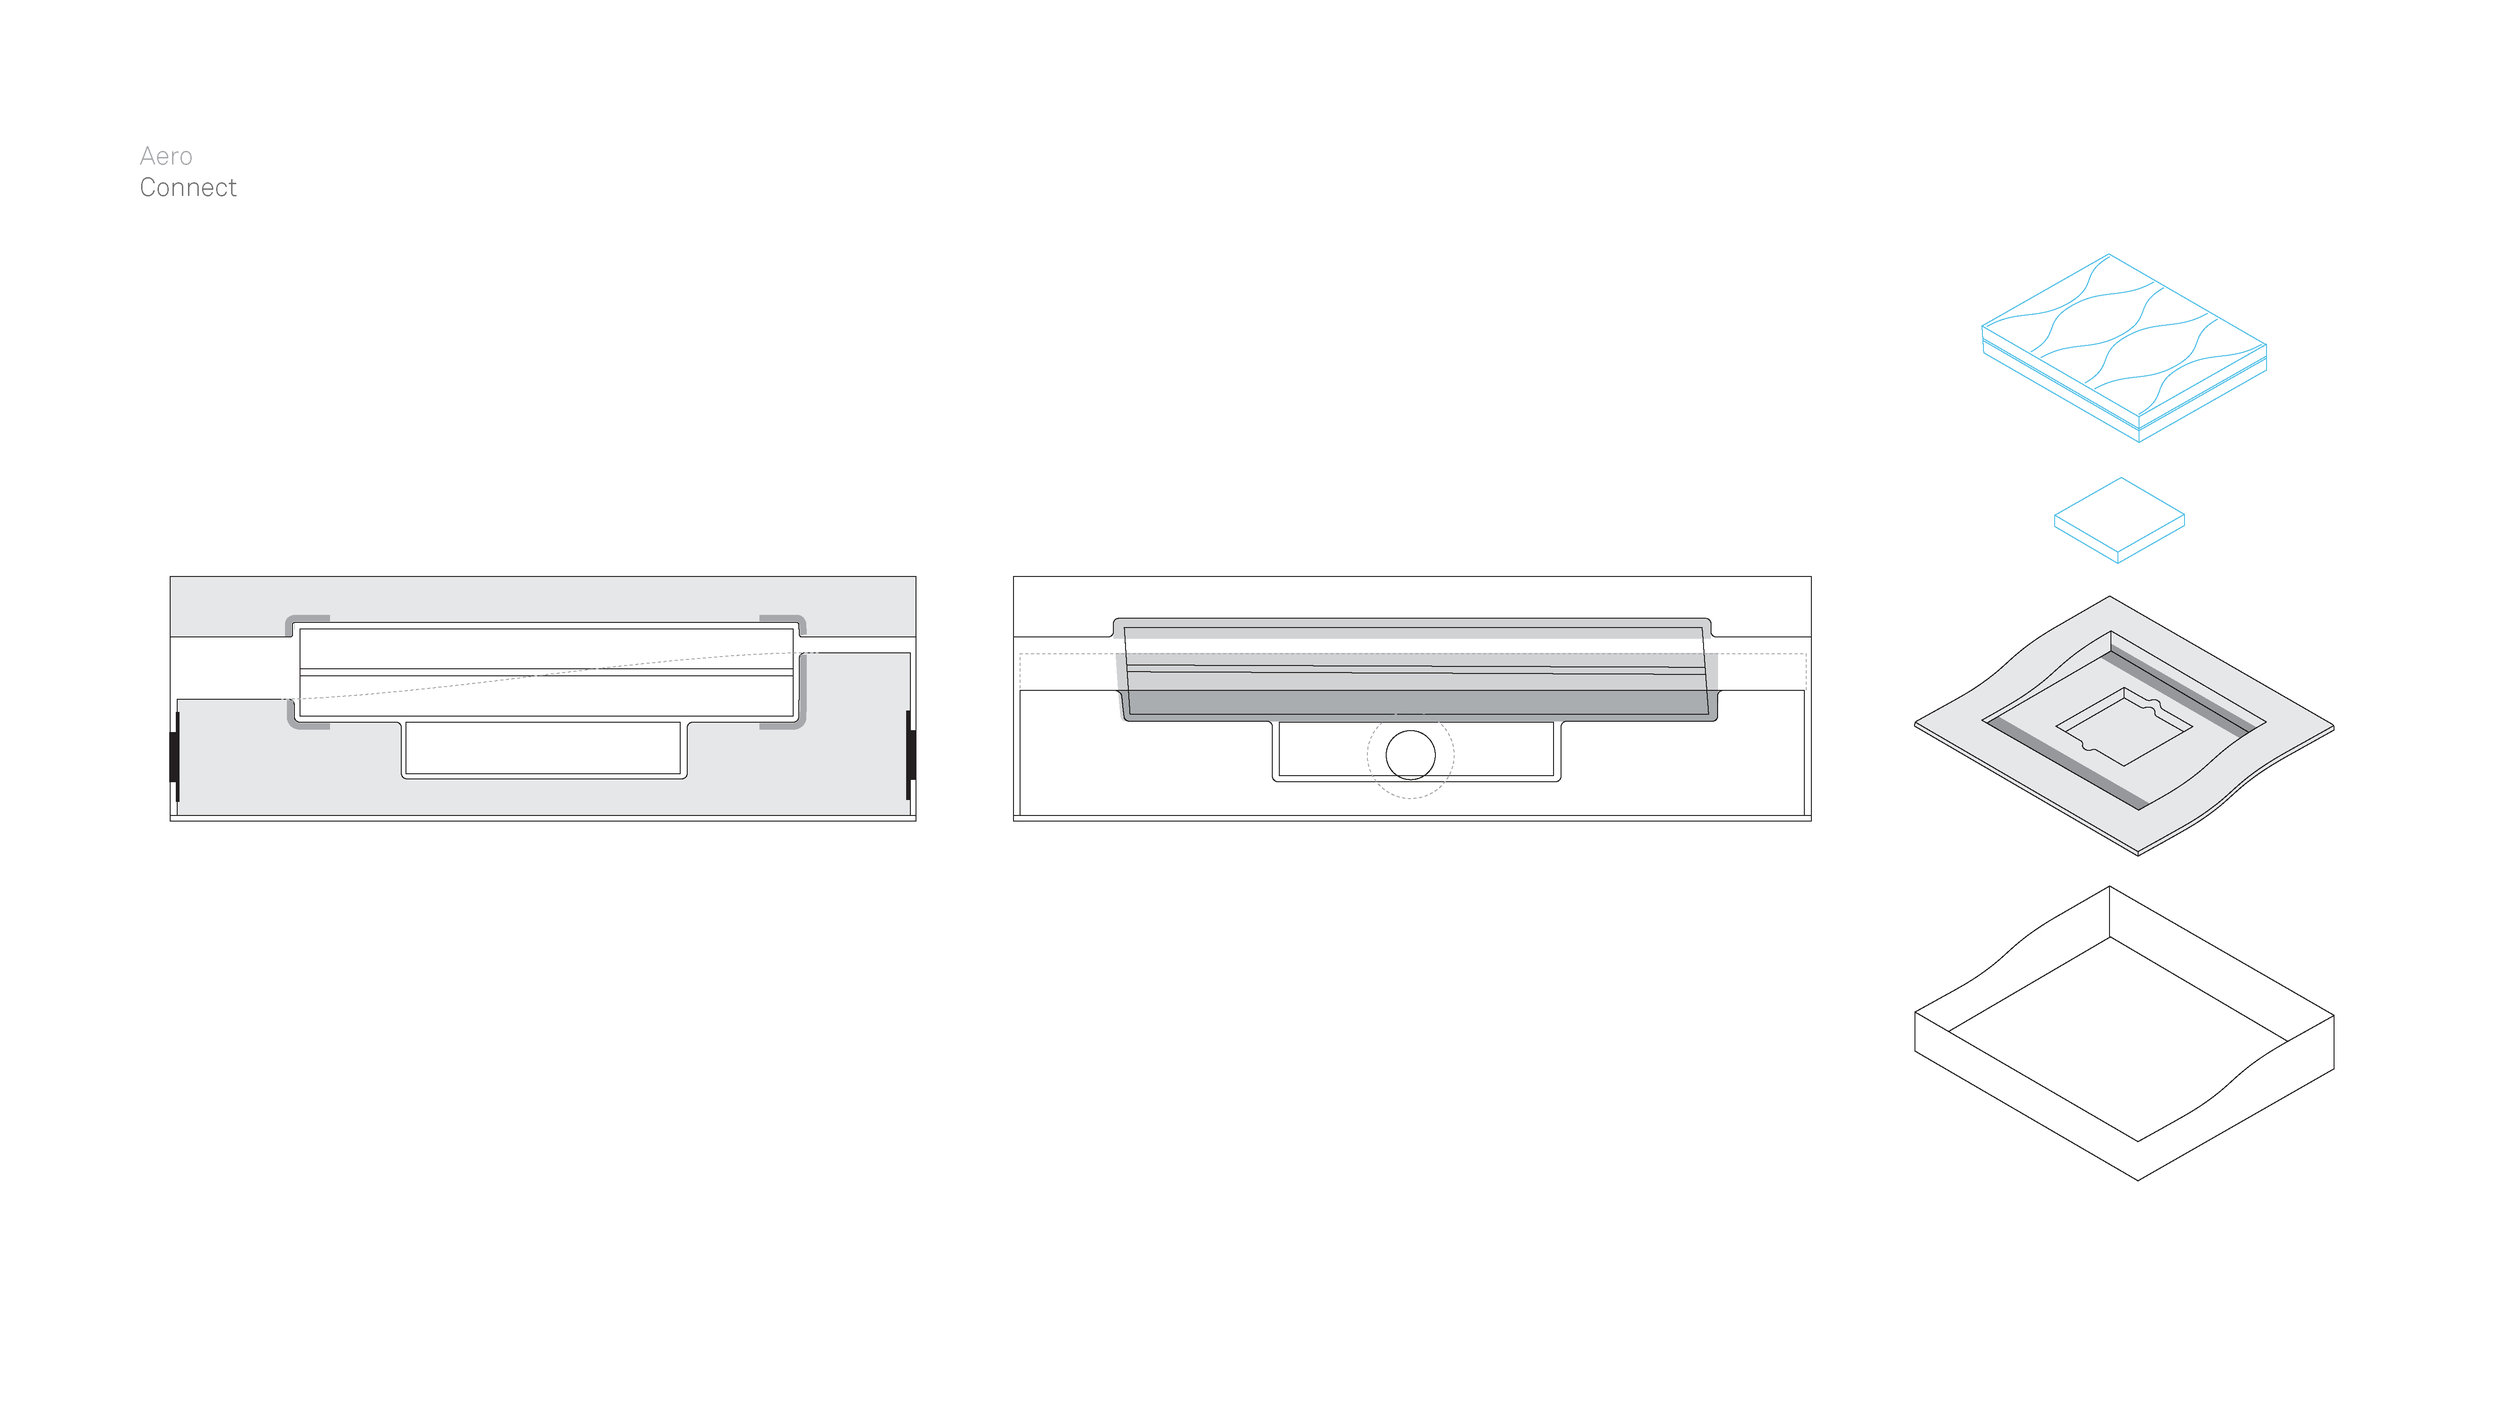 B&W_LibertySuite_PackagingStructure_R142.jpg